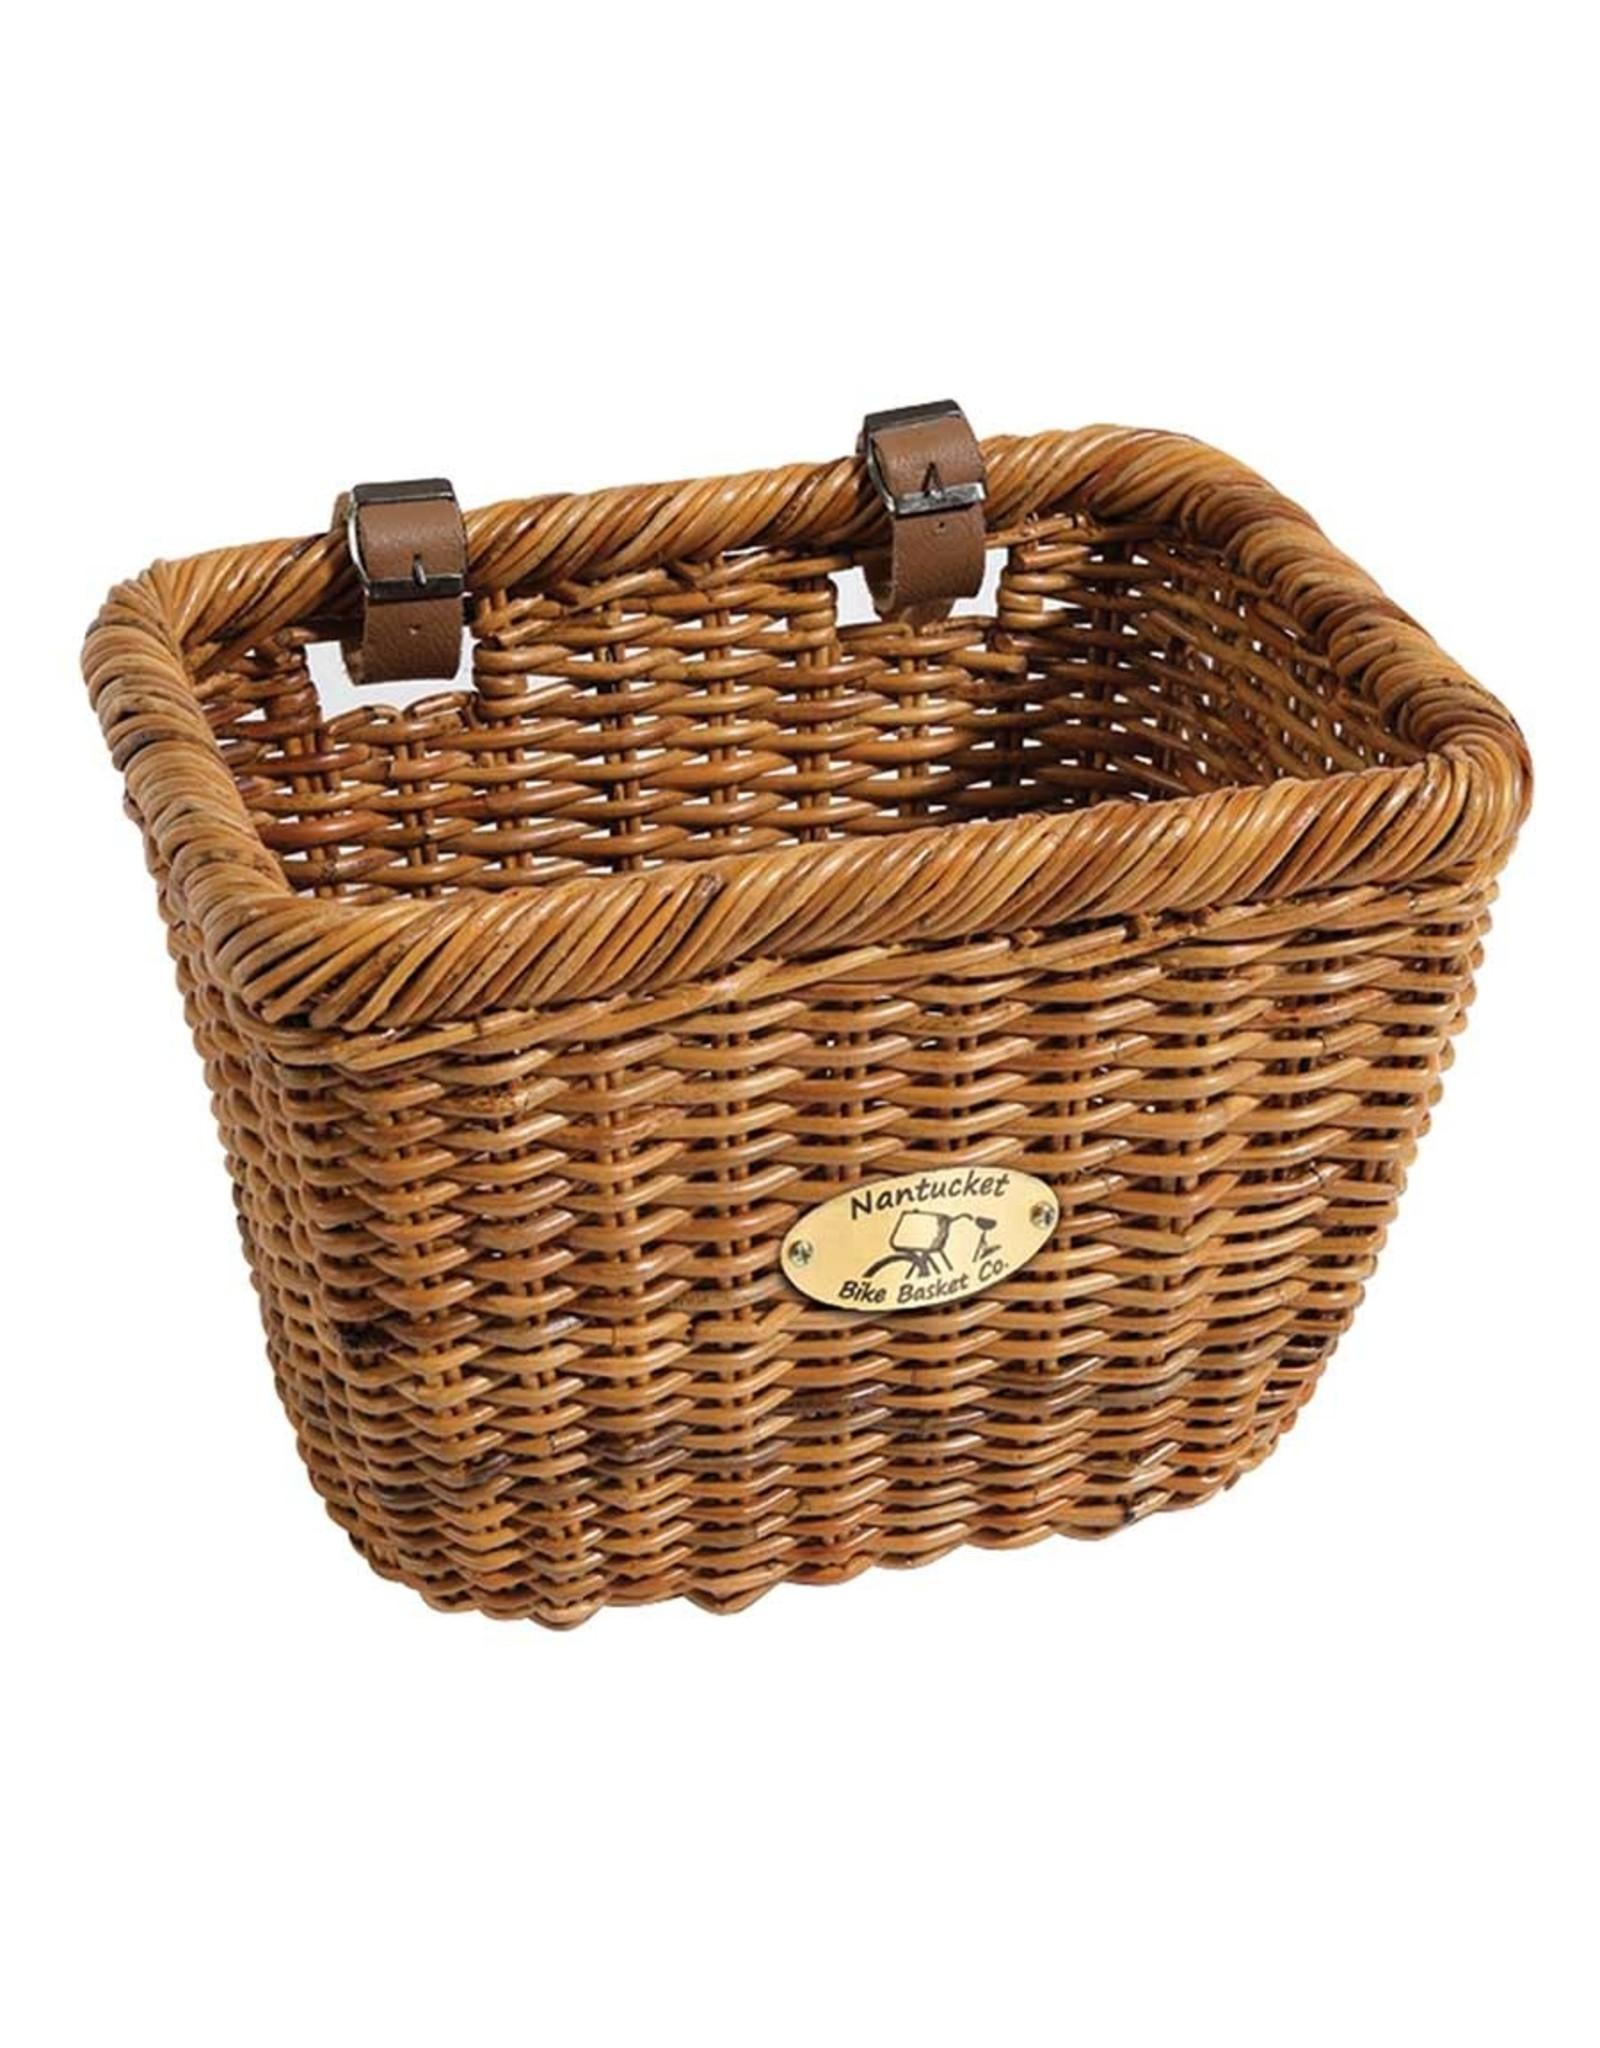 Nantucket, Cisco, Rectangular Basket, 13''x10.75''x9.5''